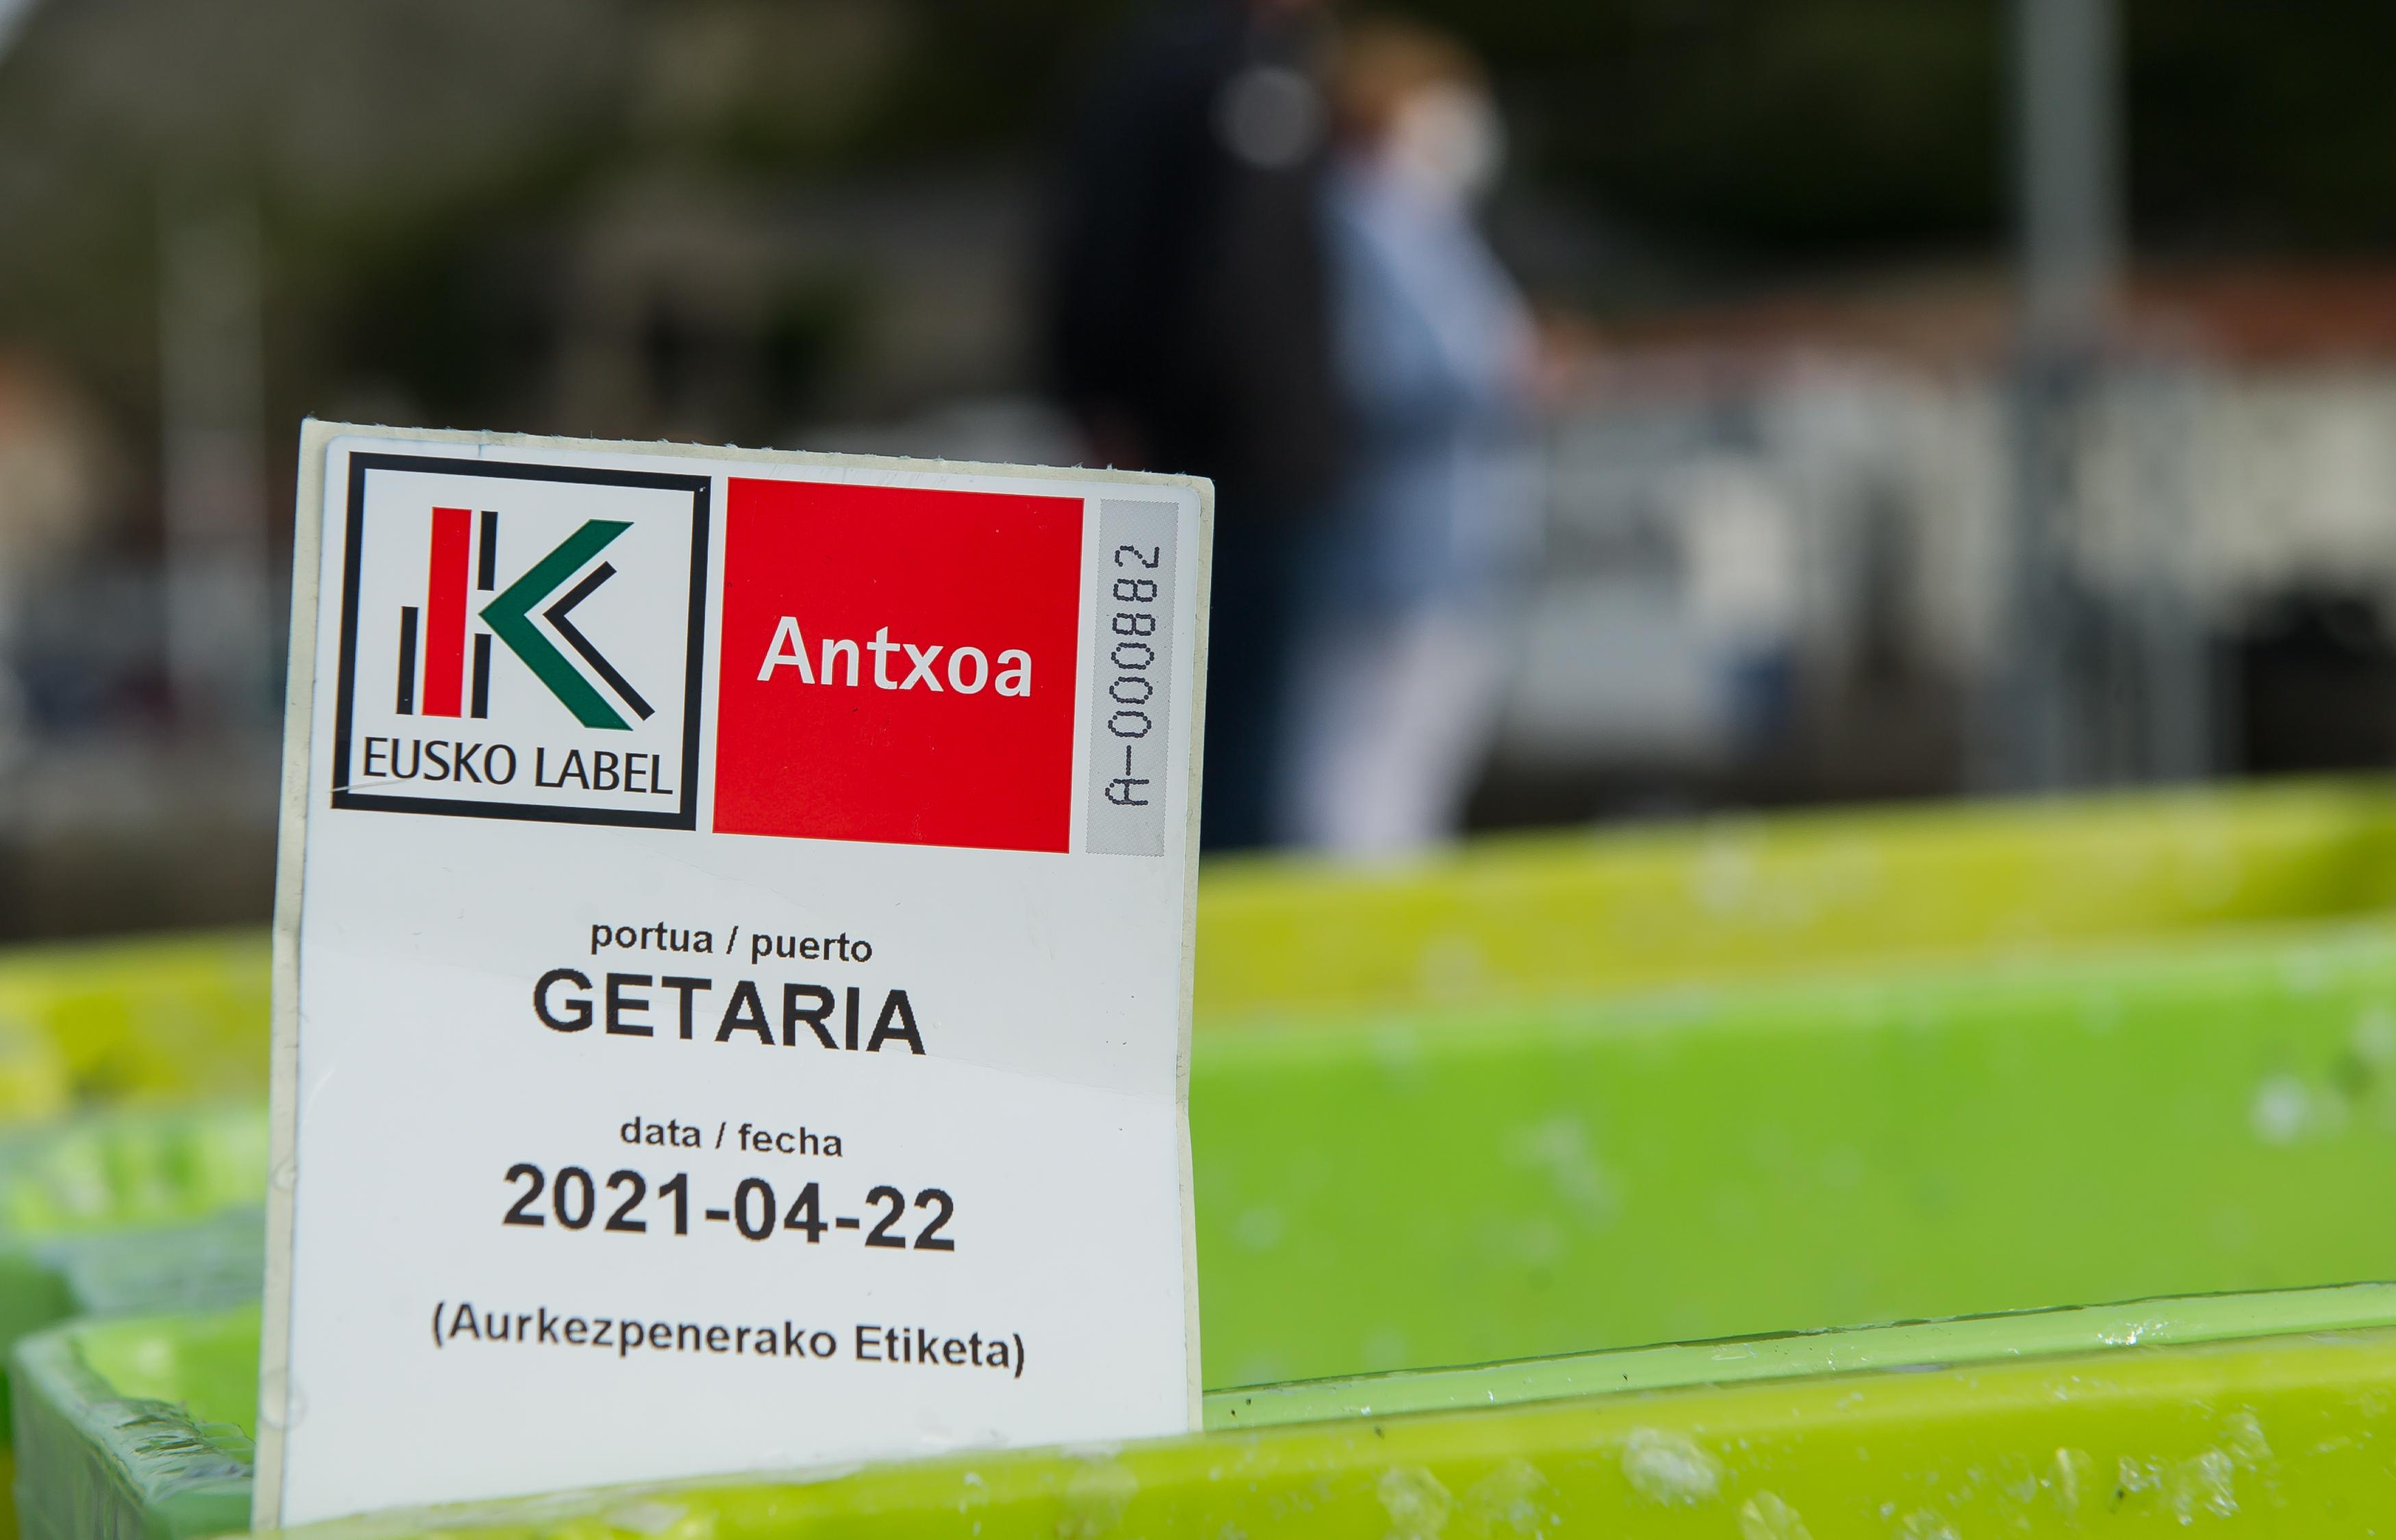 20210421-TAPIA-ANTXOA-133.jpg